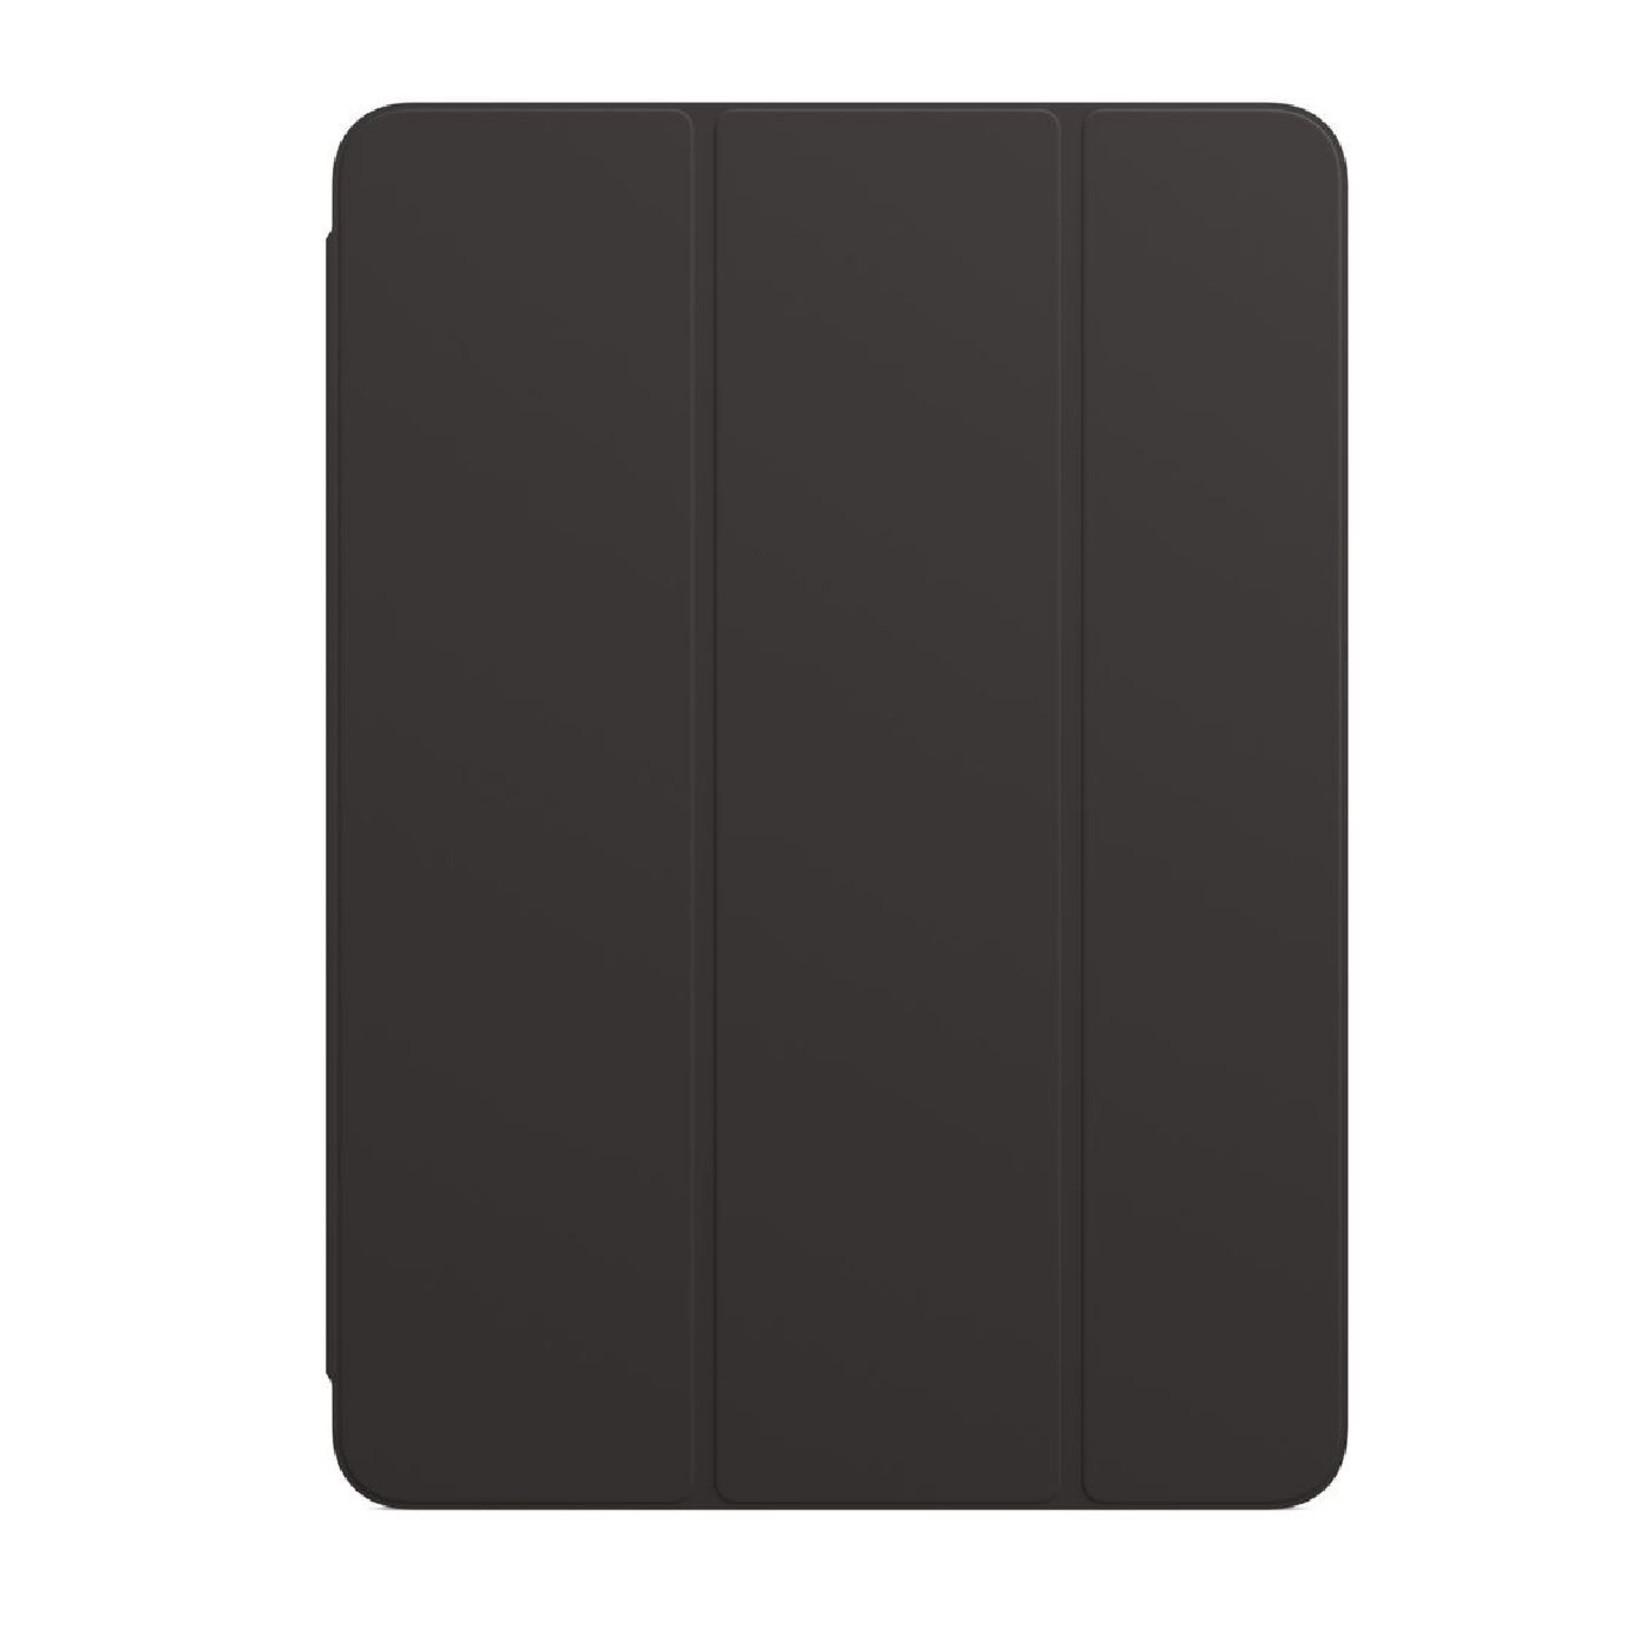 Apple iPad Smart Cover Black